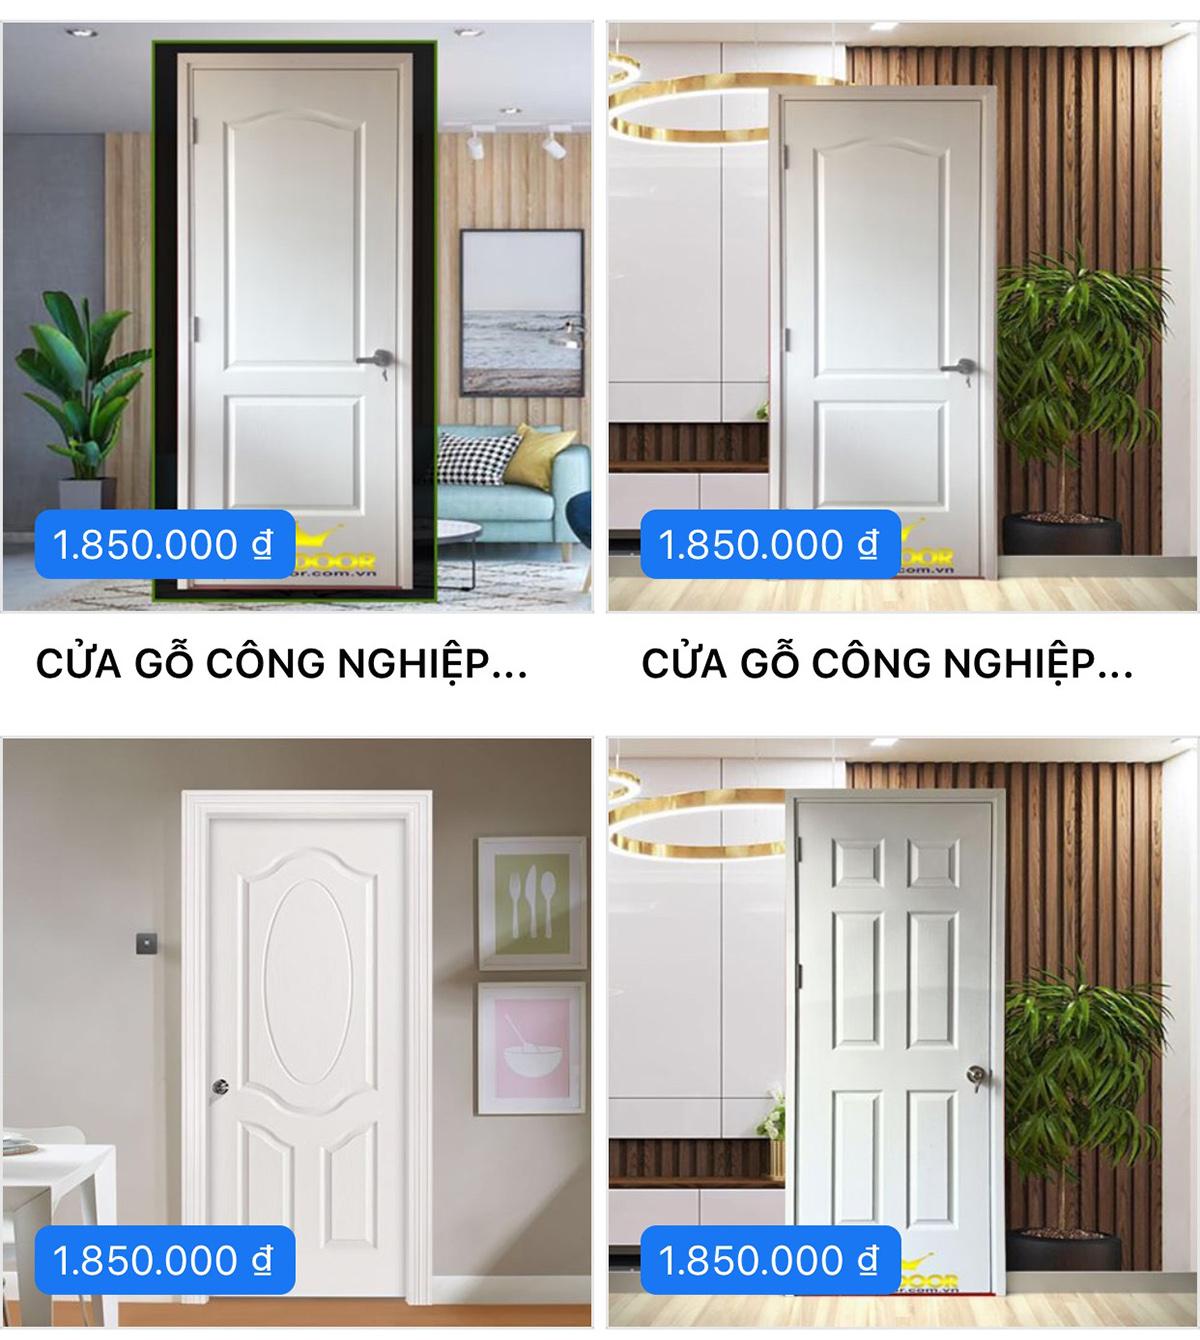 Mẫu cửa gỗ HDF sơn